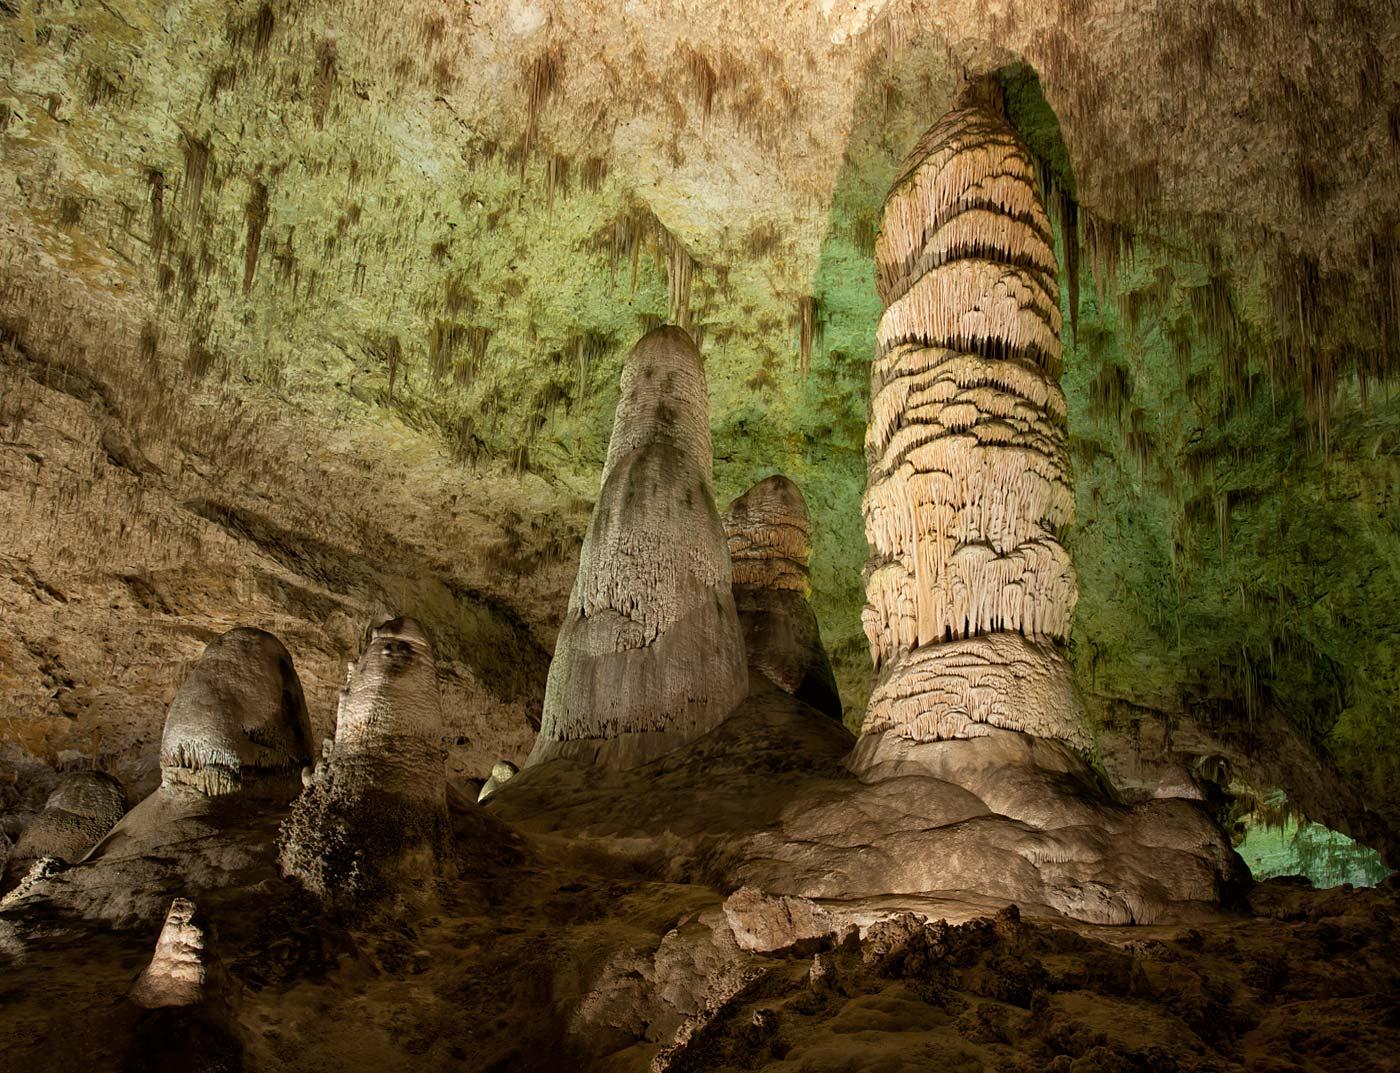 Carlsbad-Caverns-National-Park-ABP-Hall-of-Giants2.jpg